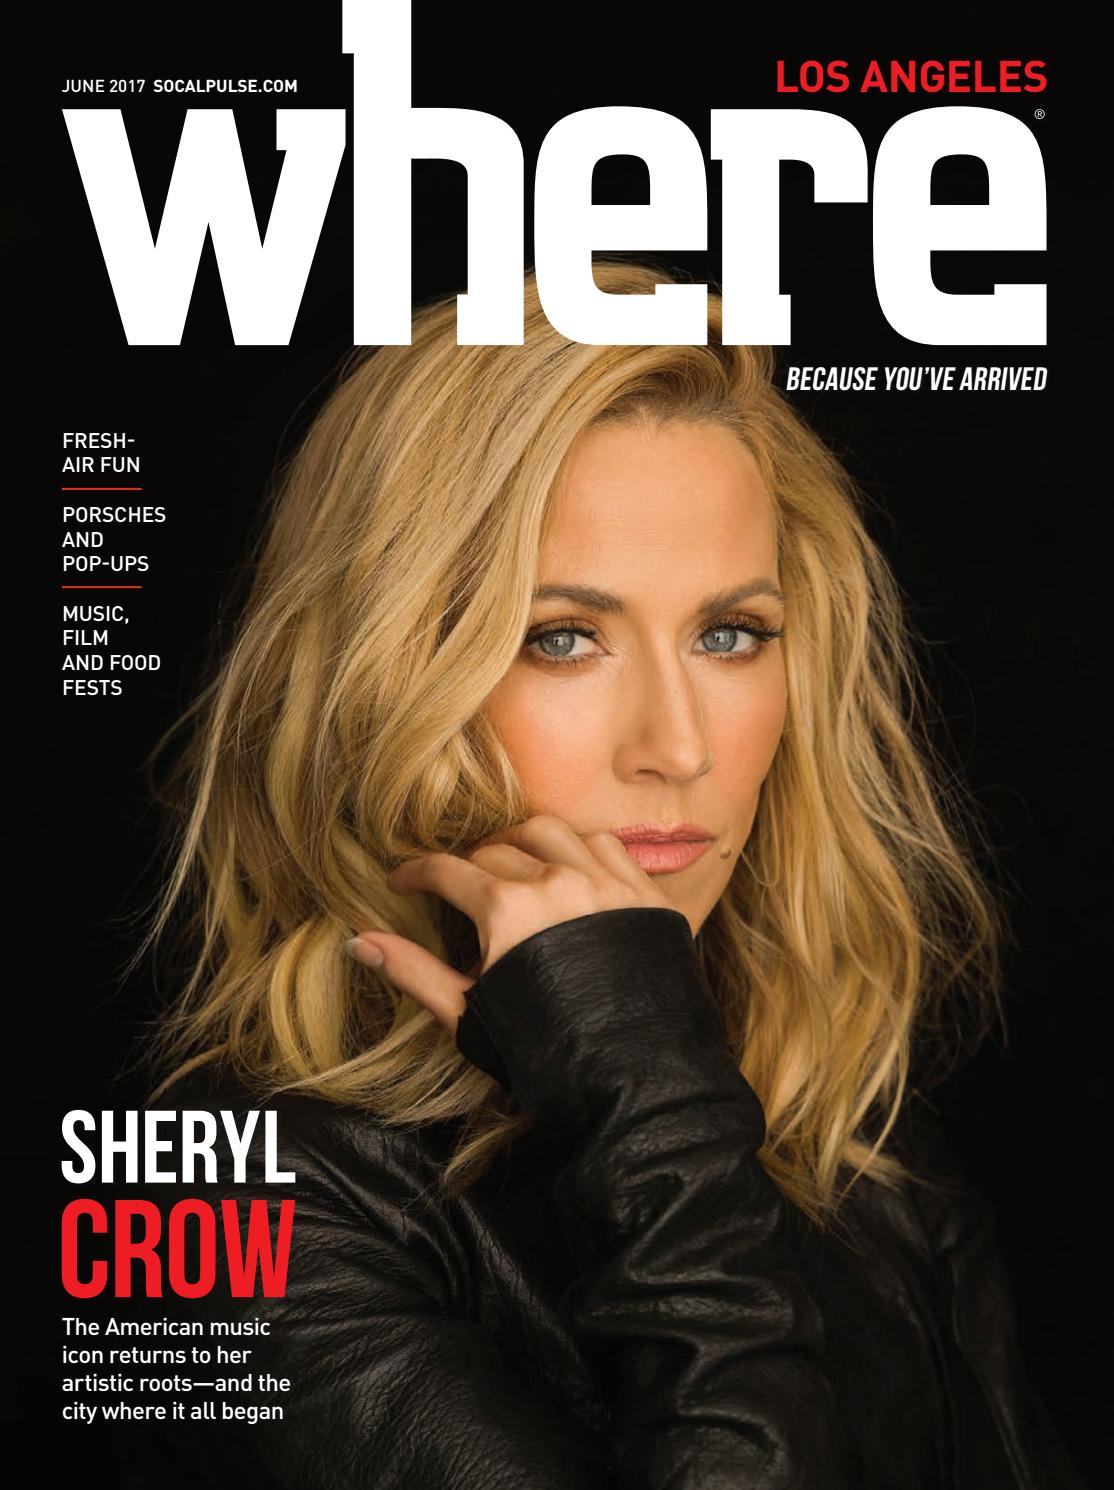 ee46f59aff36 WHERE Los Angeles Magazine June 2017 by SoCalMedia - issuu